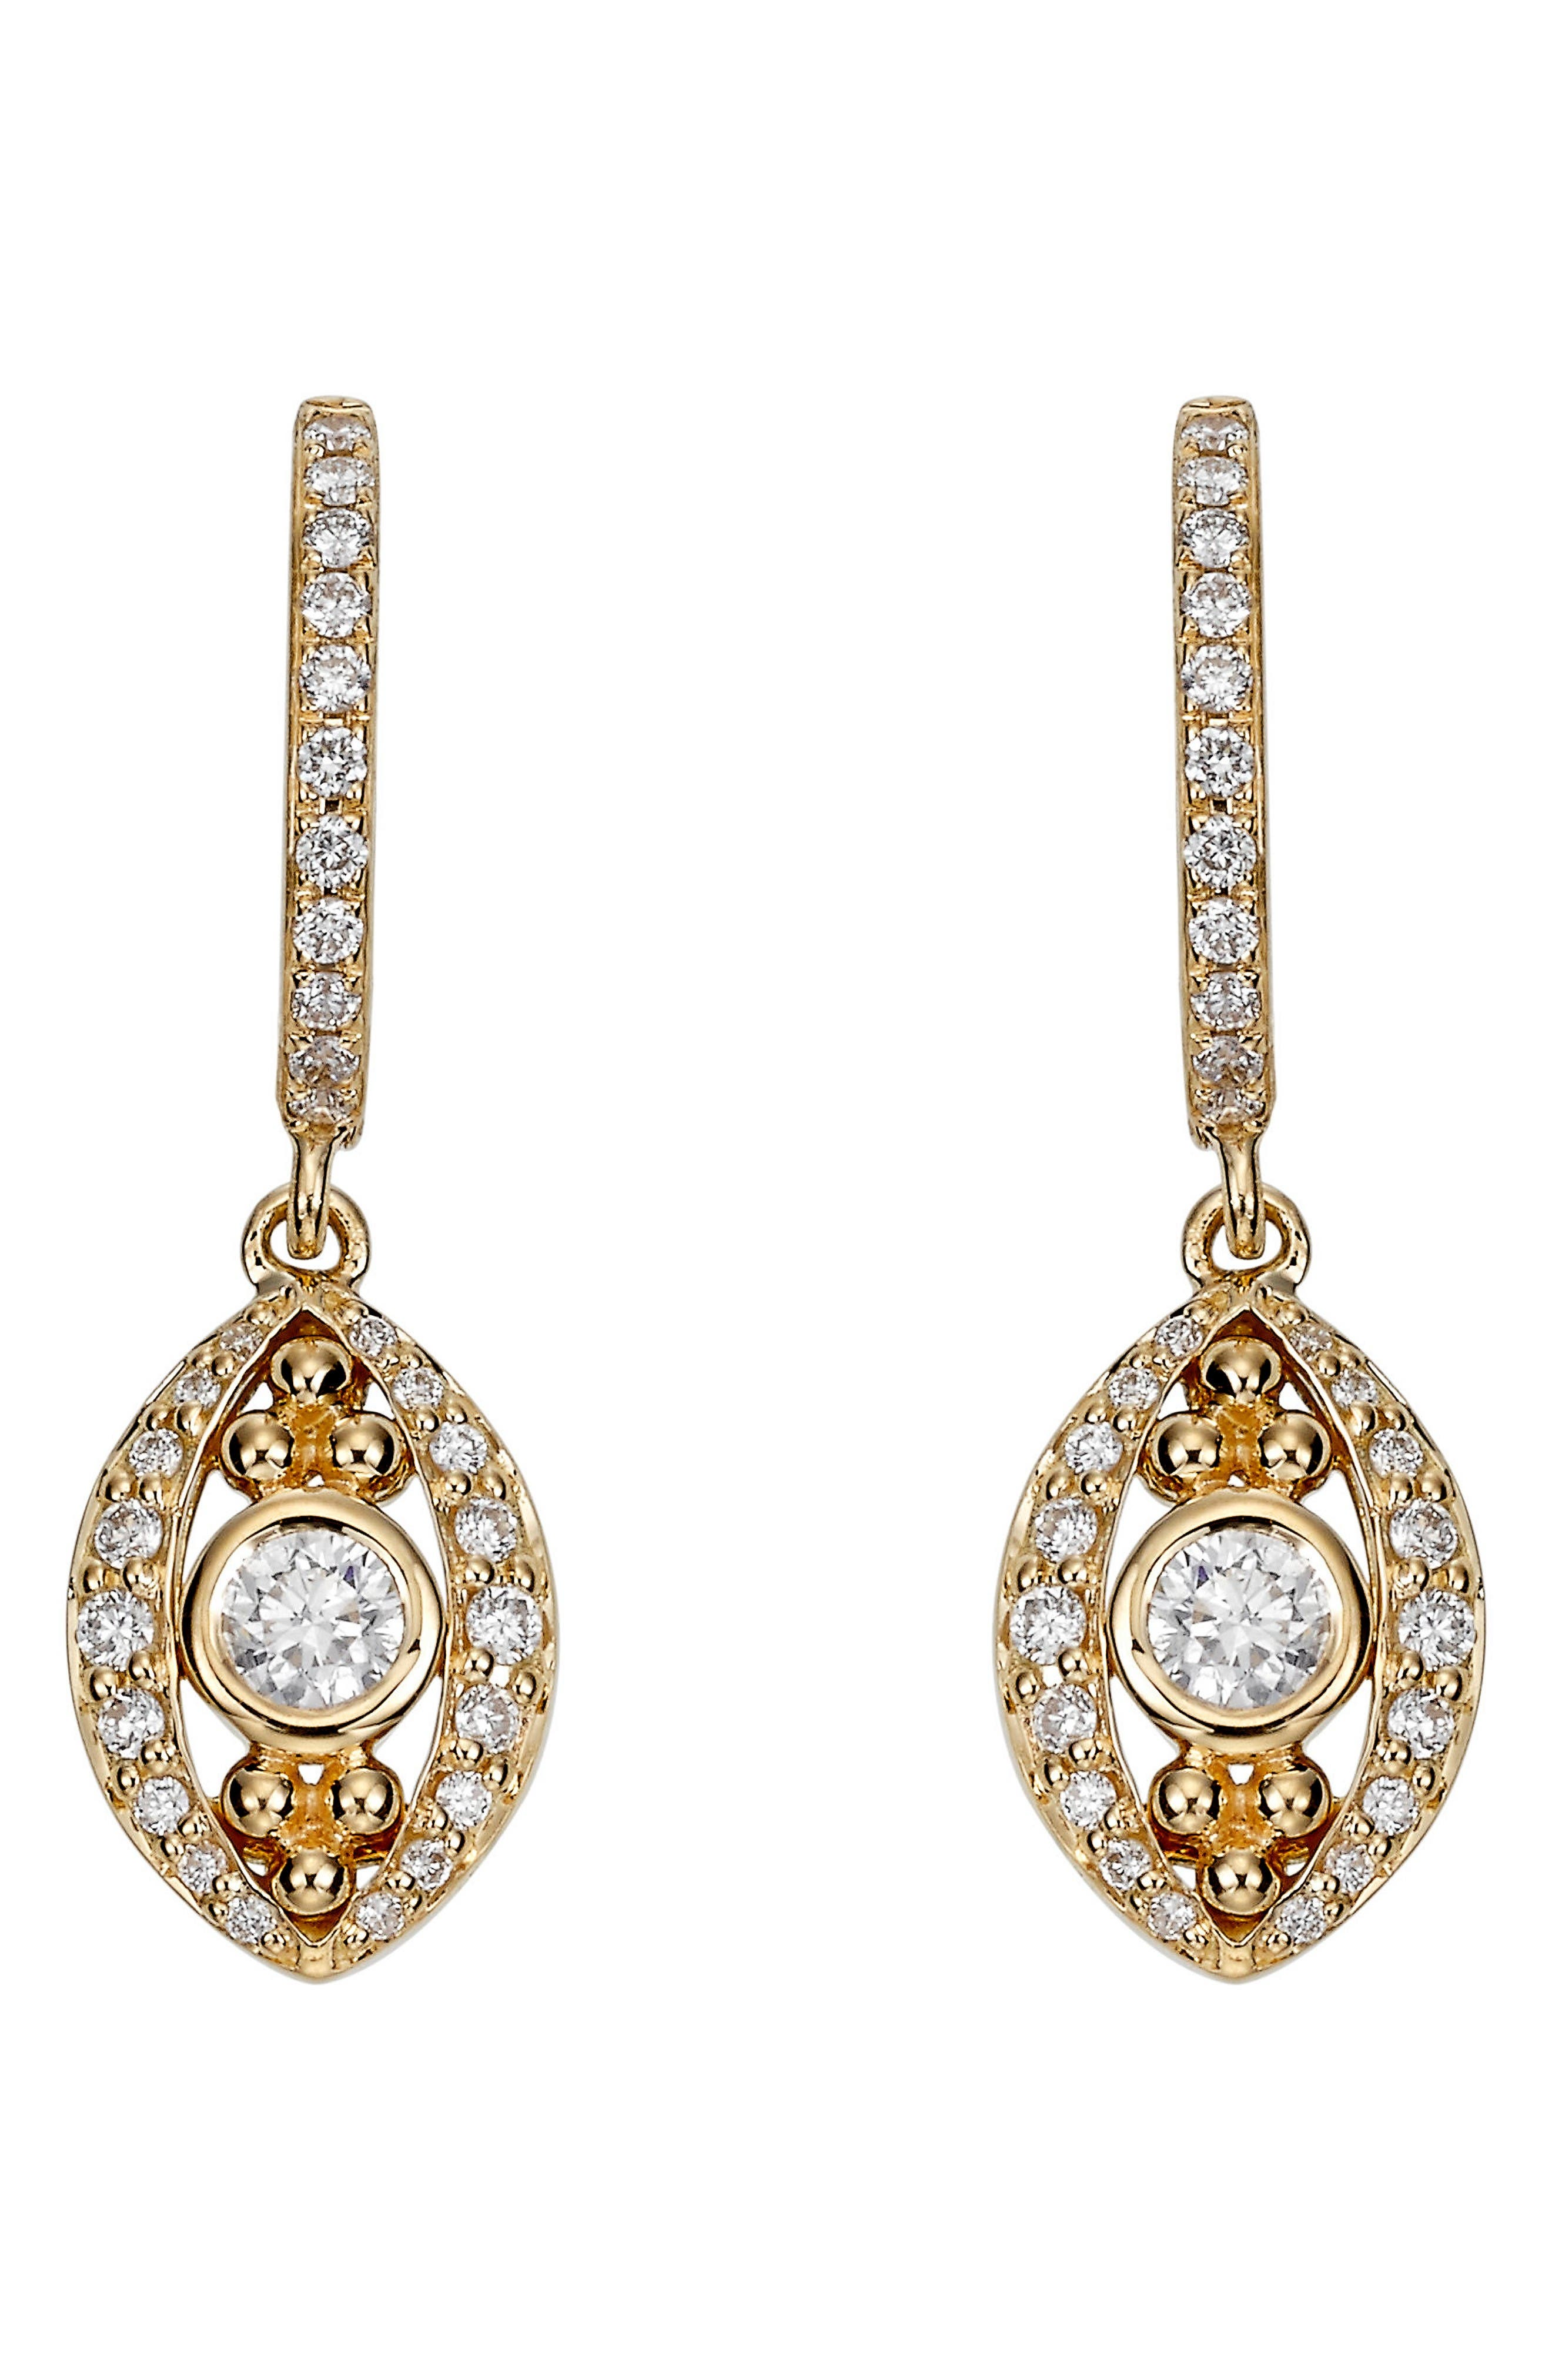 Alternate Image 1 Selected - Temple St. Clair Evil Eye Diamond Drop Earrings